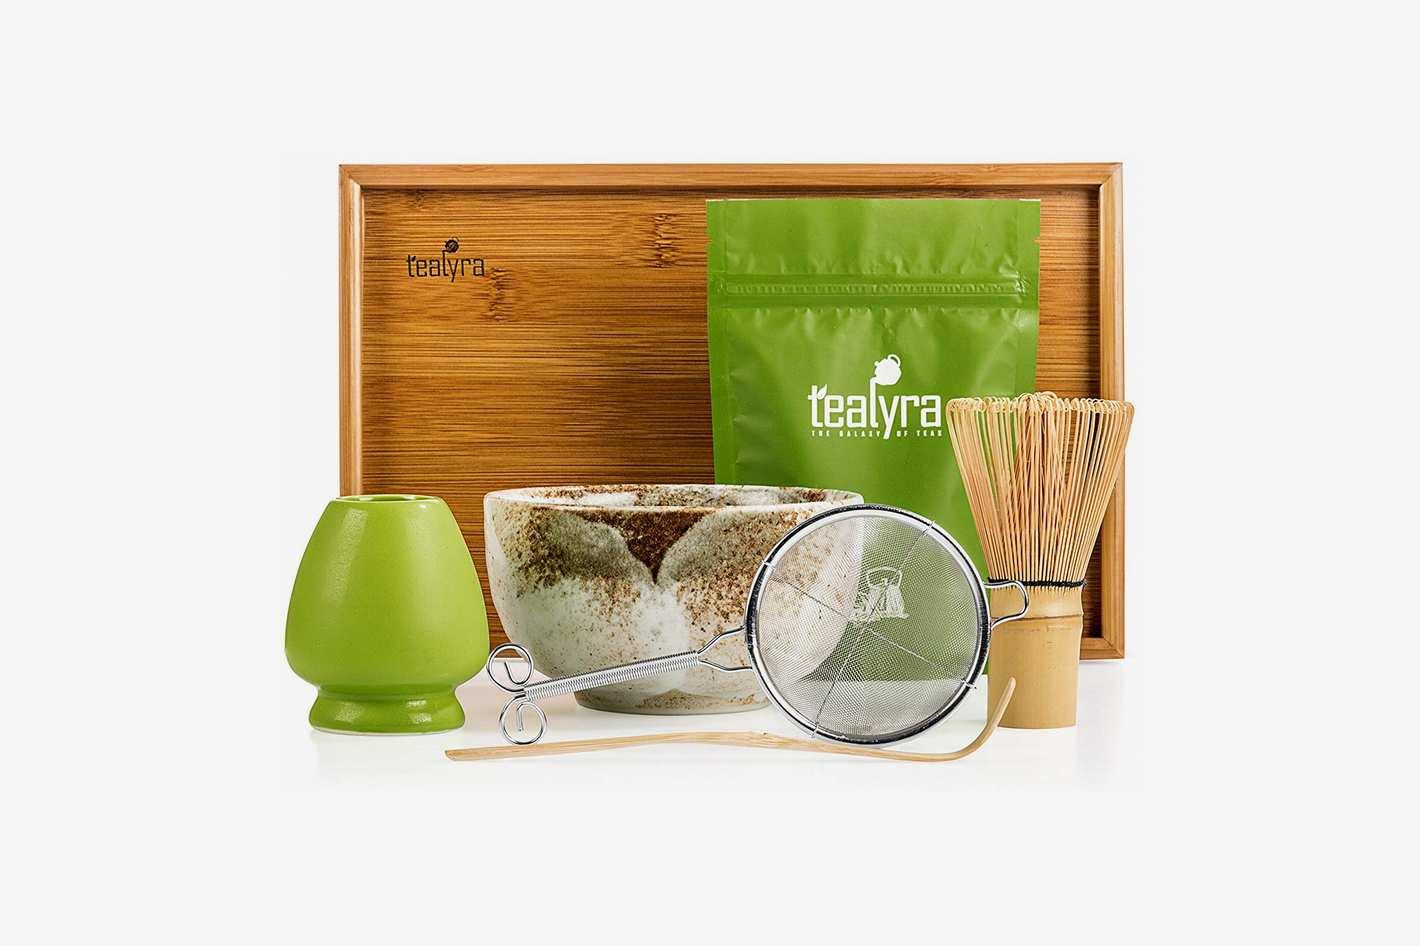 Tealyra - Matcha Kit - Connoisseur Ceremony Start Up Set